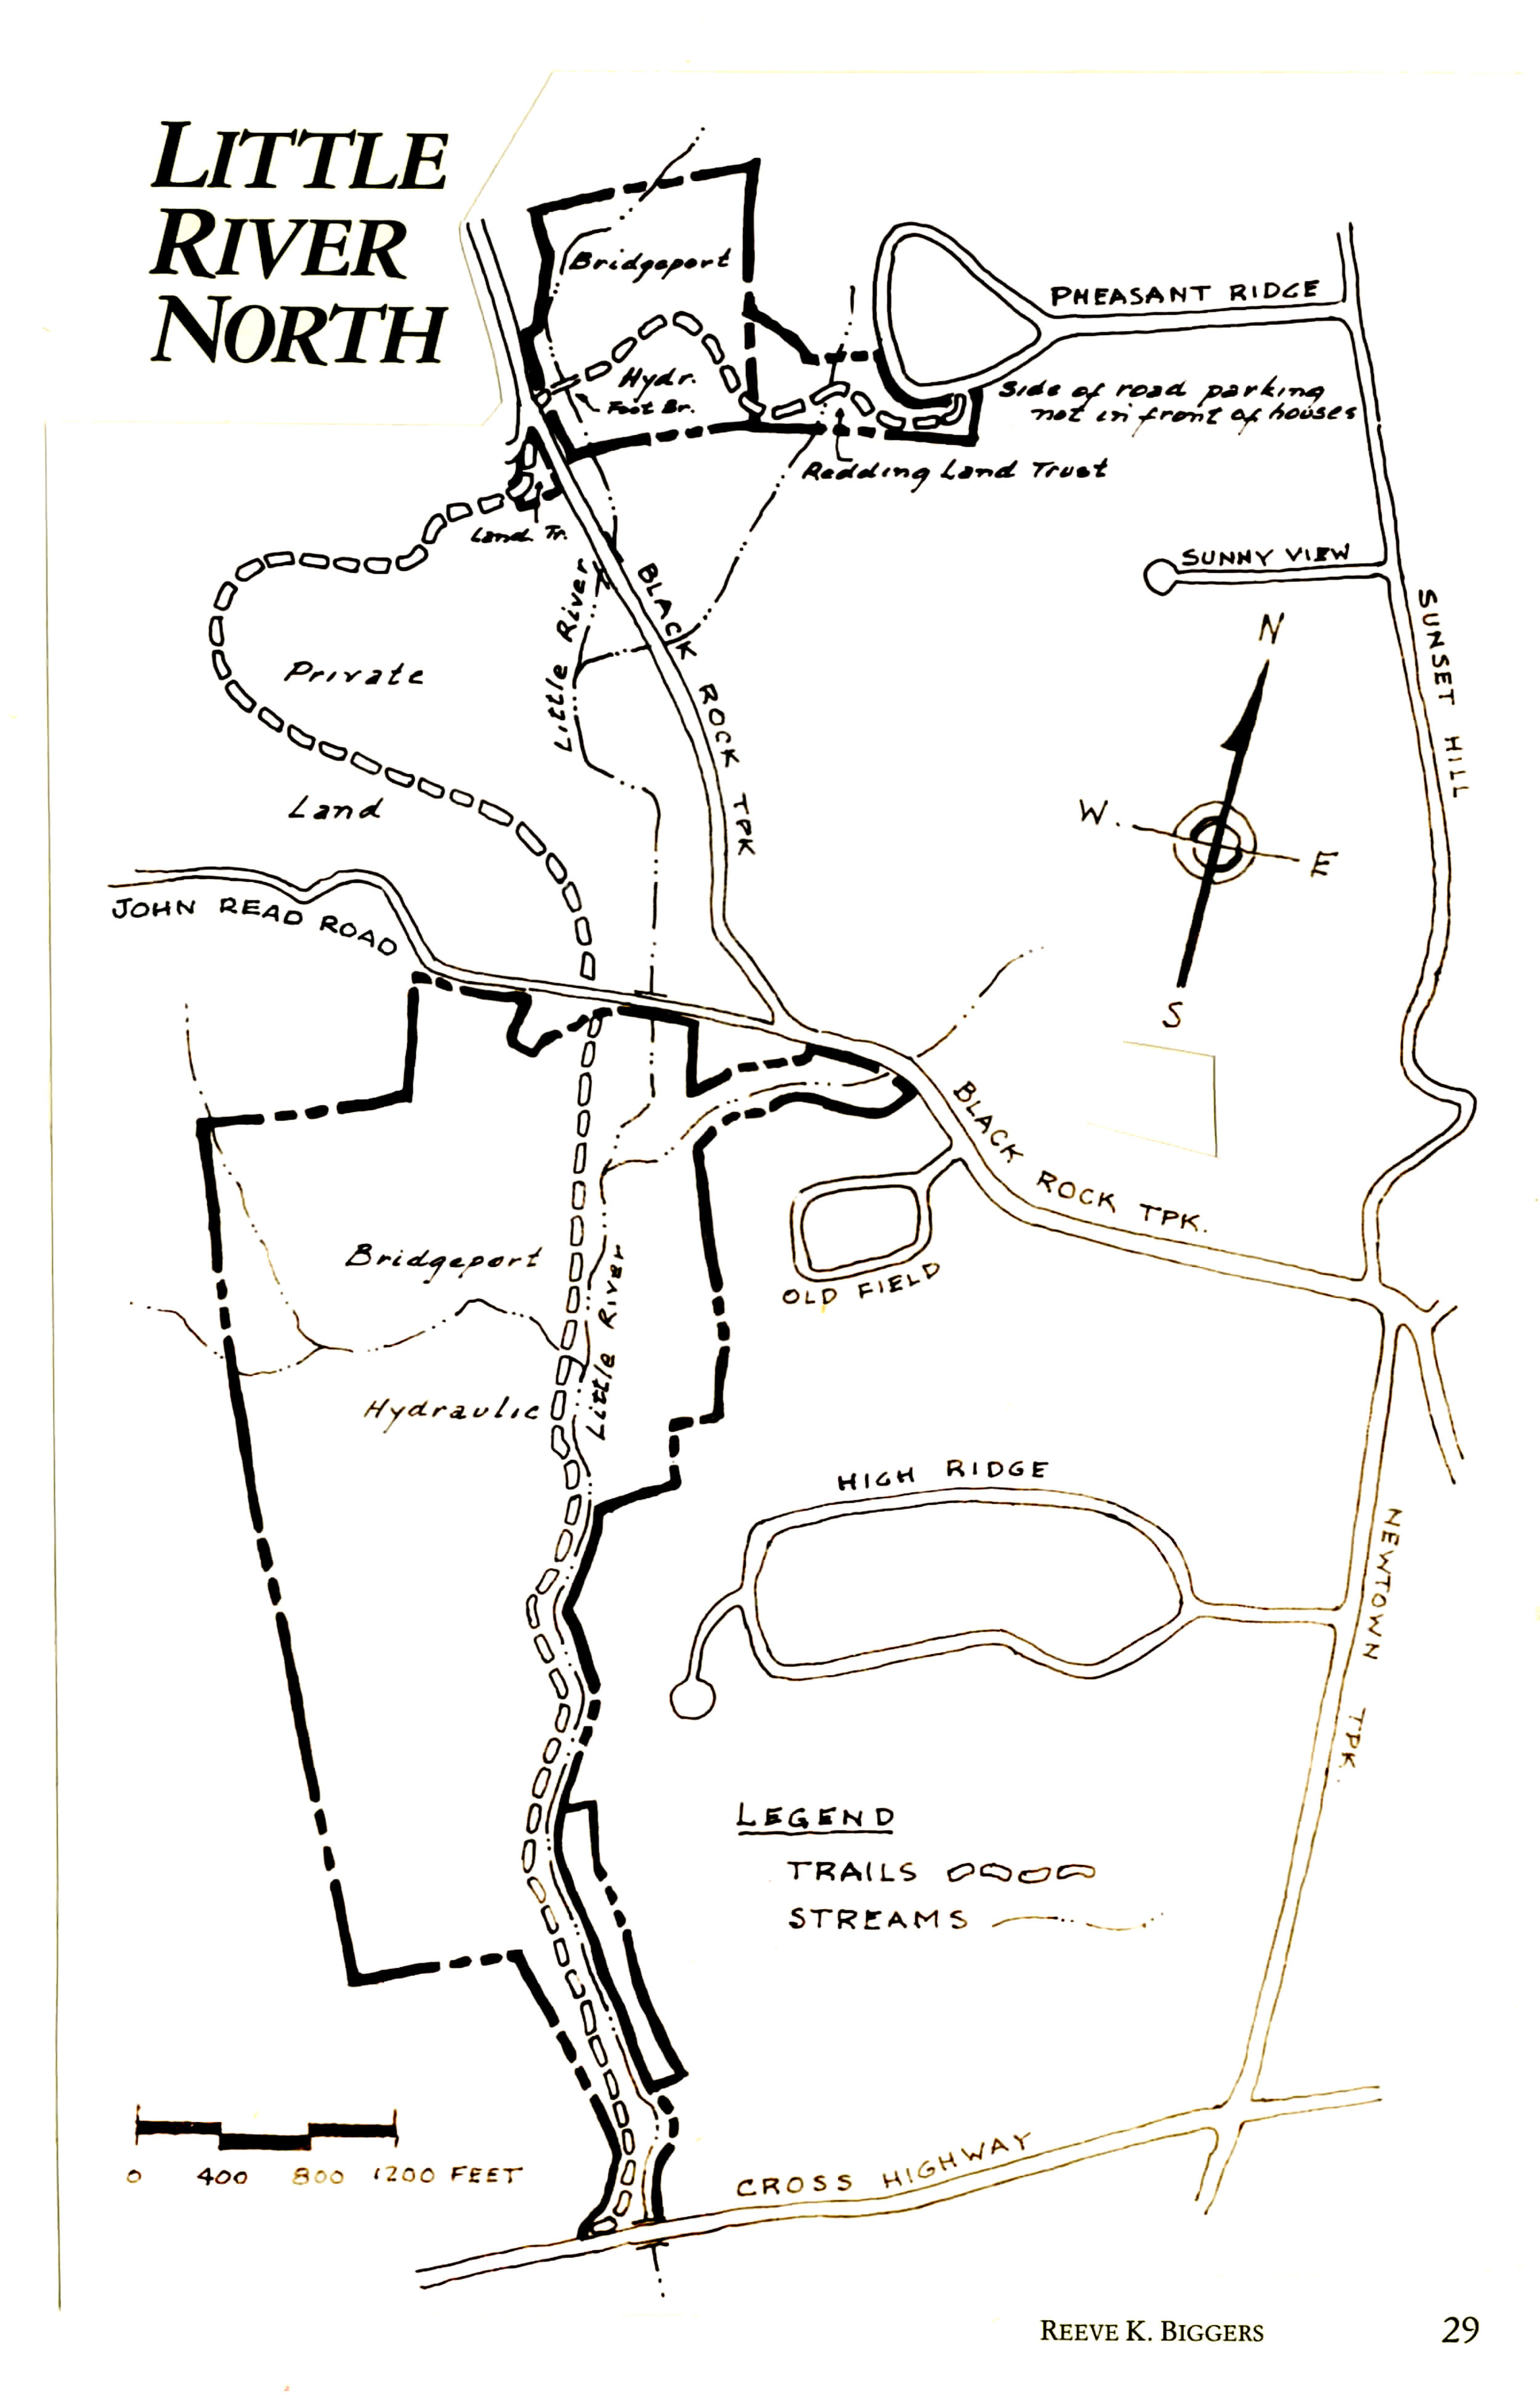 bot-map-little-river-north.jpg